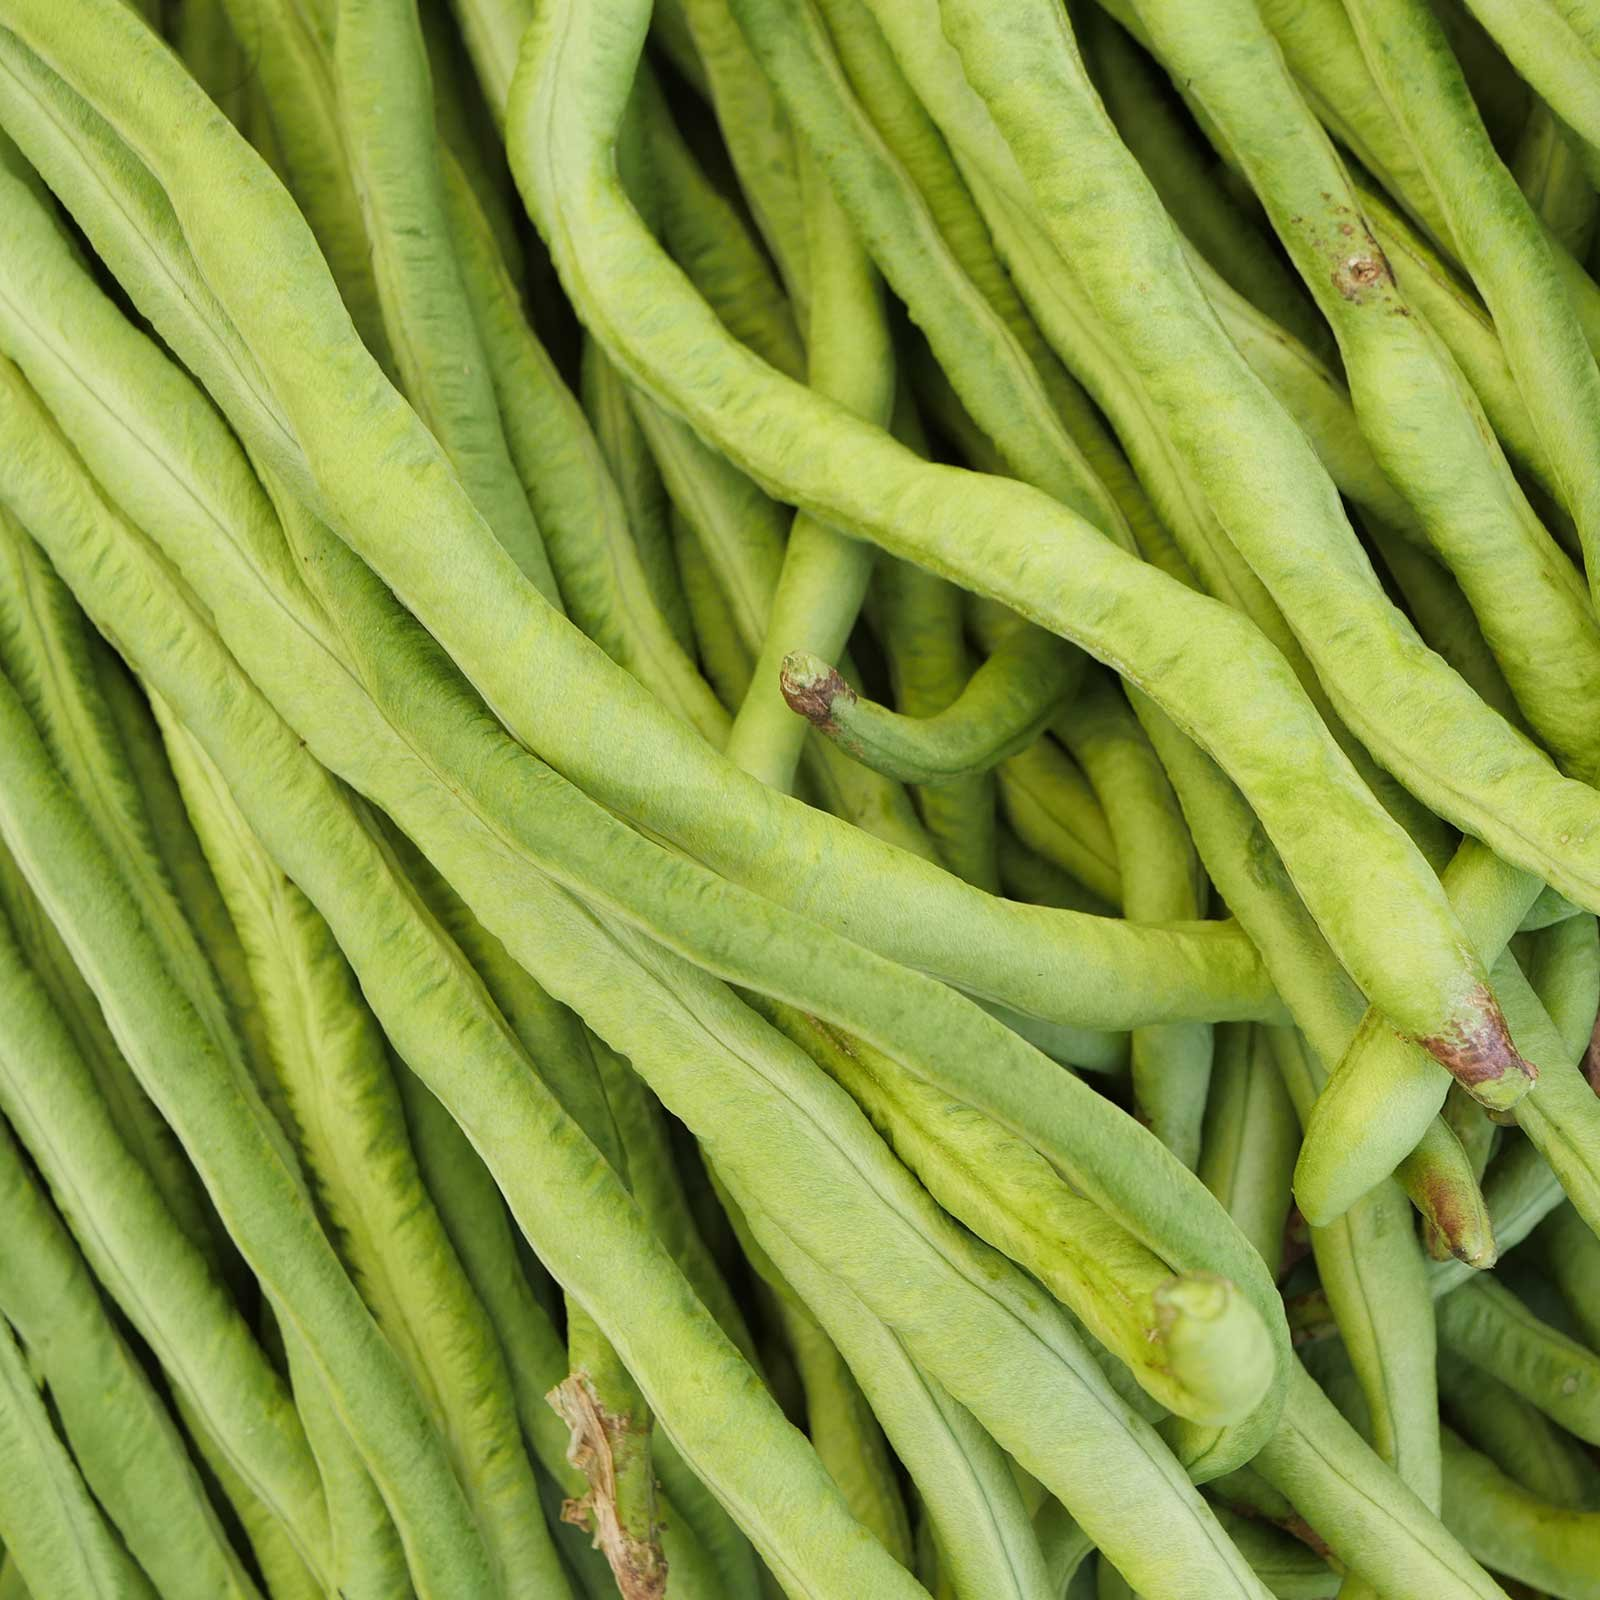 California Black-Eye Bush Beans - 50 Lb Bulk - Non-GMO, Heirloom - Black-Eyed Peas (Cowpeas) - Vegetable Garden Seeds